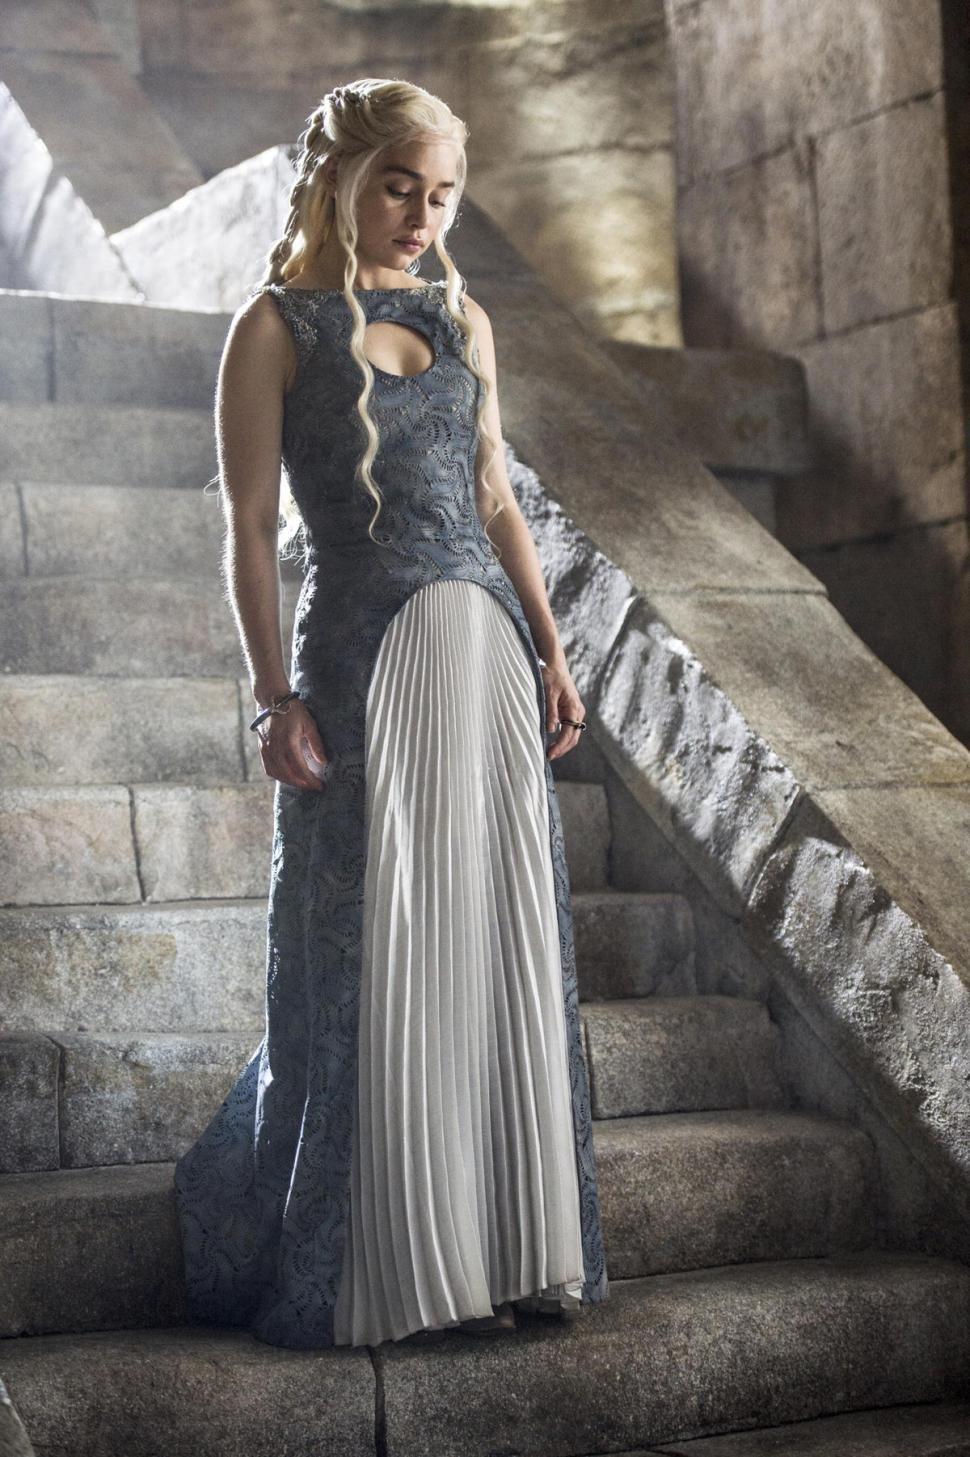 Daenerys Targaryen Costume Season 5